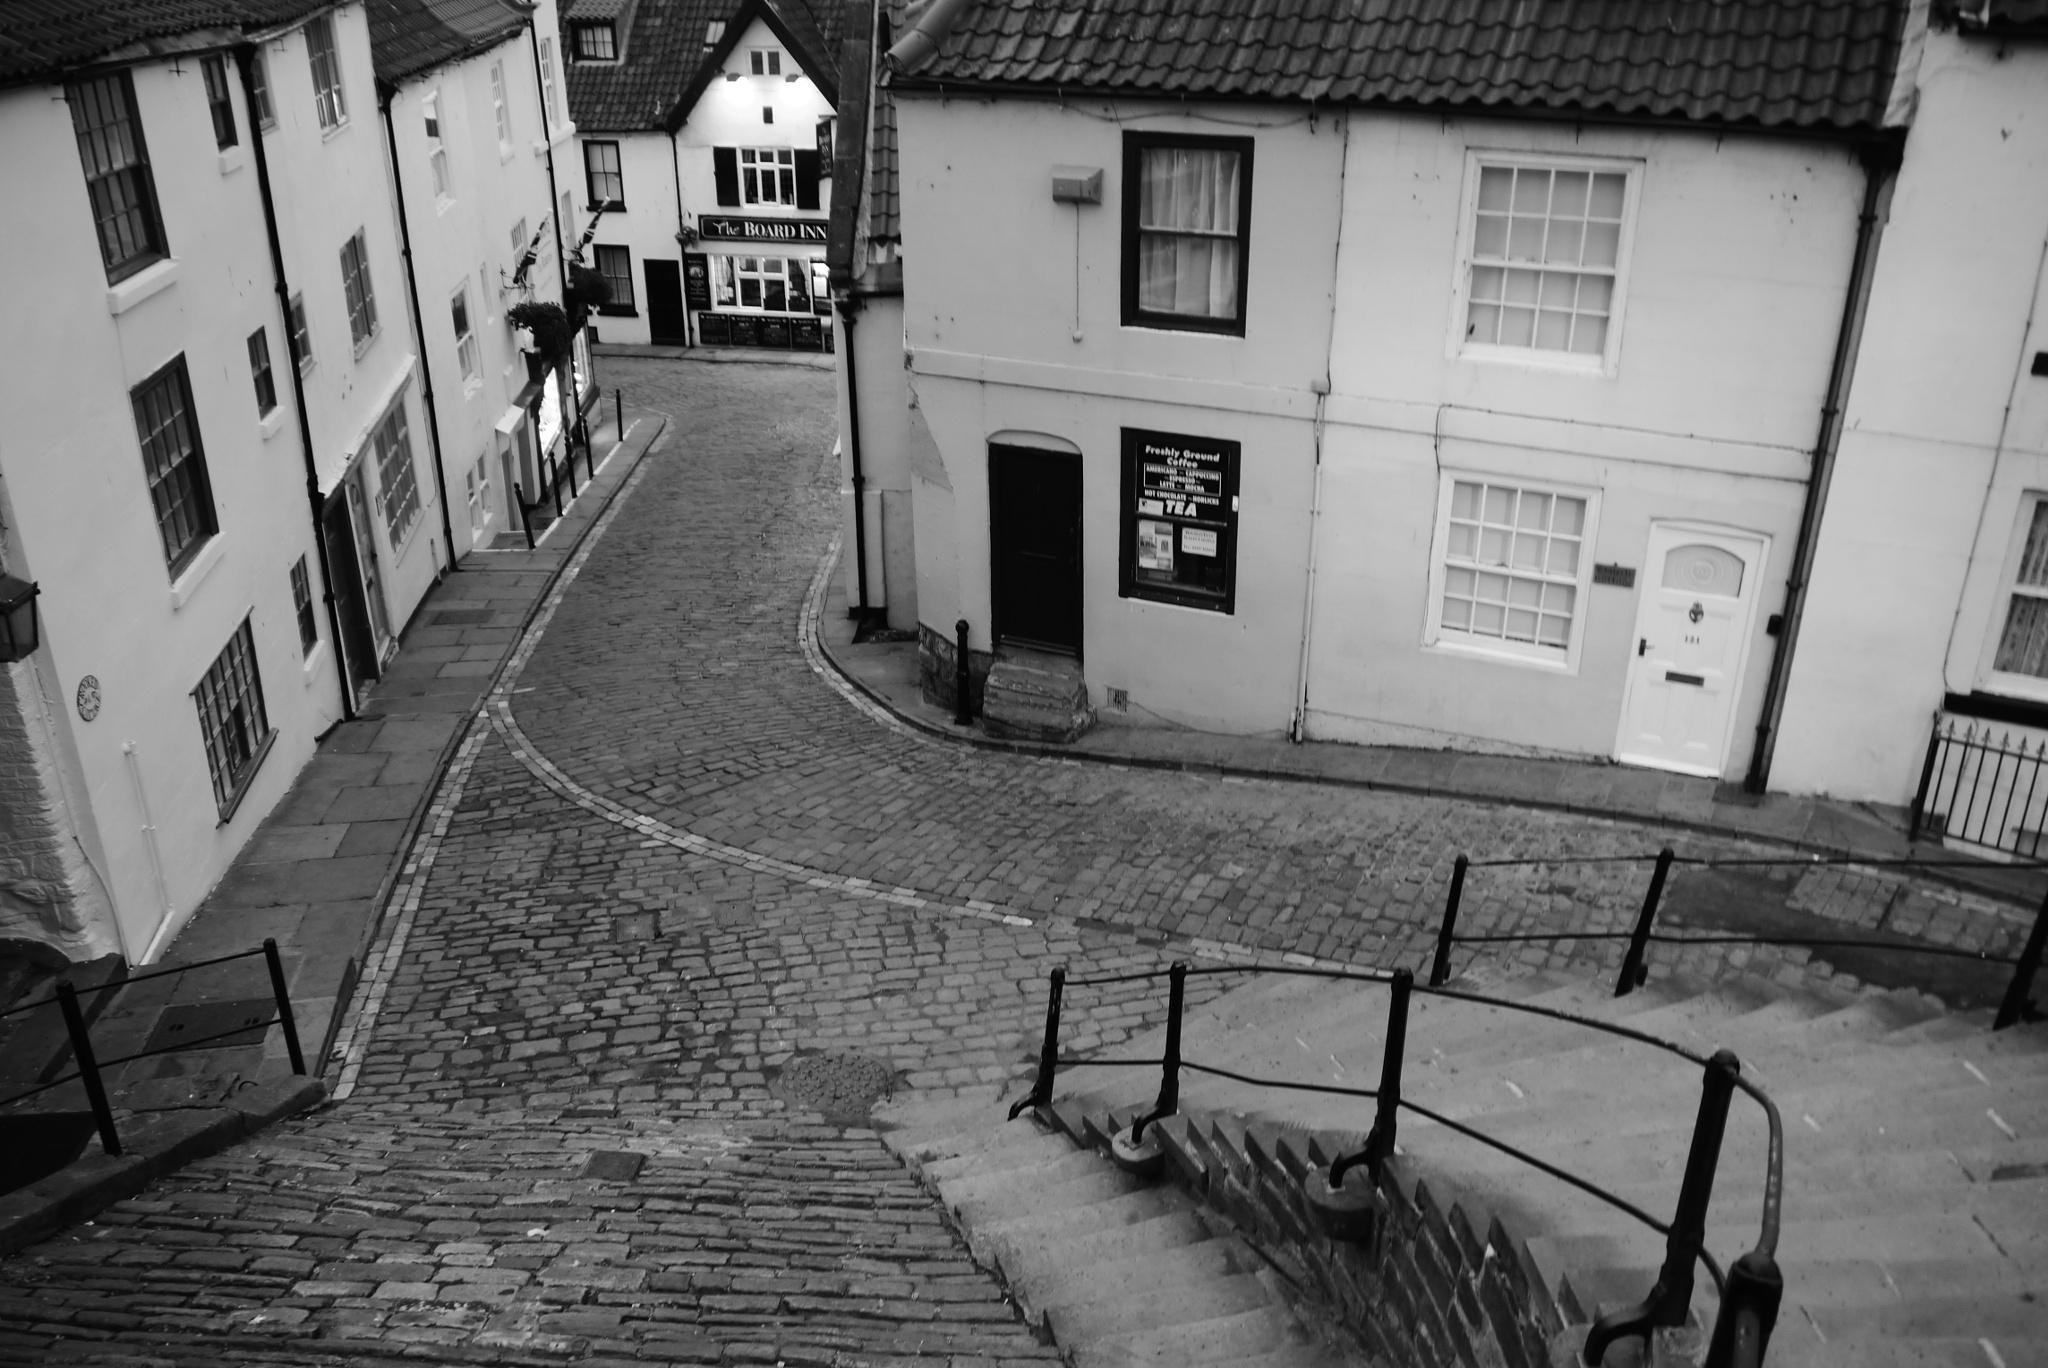 Abbey steps by AJ Yakstrangler Andy Jamieson